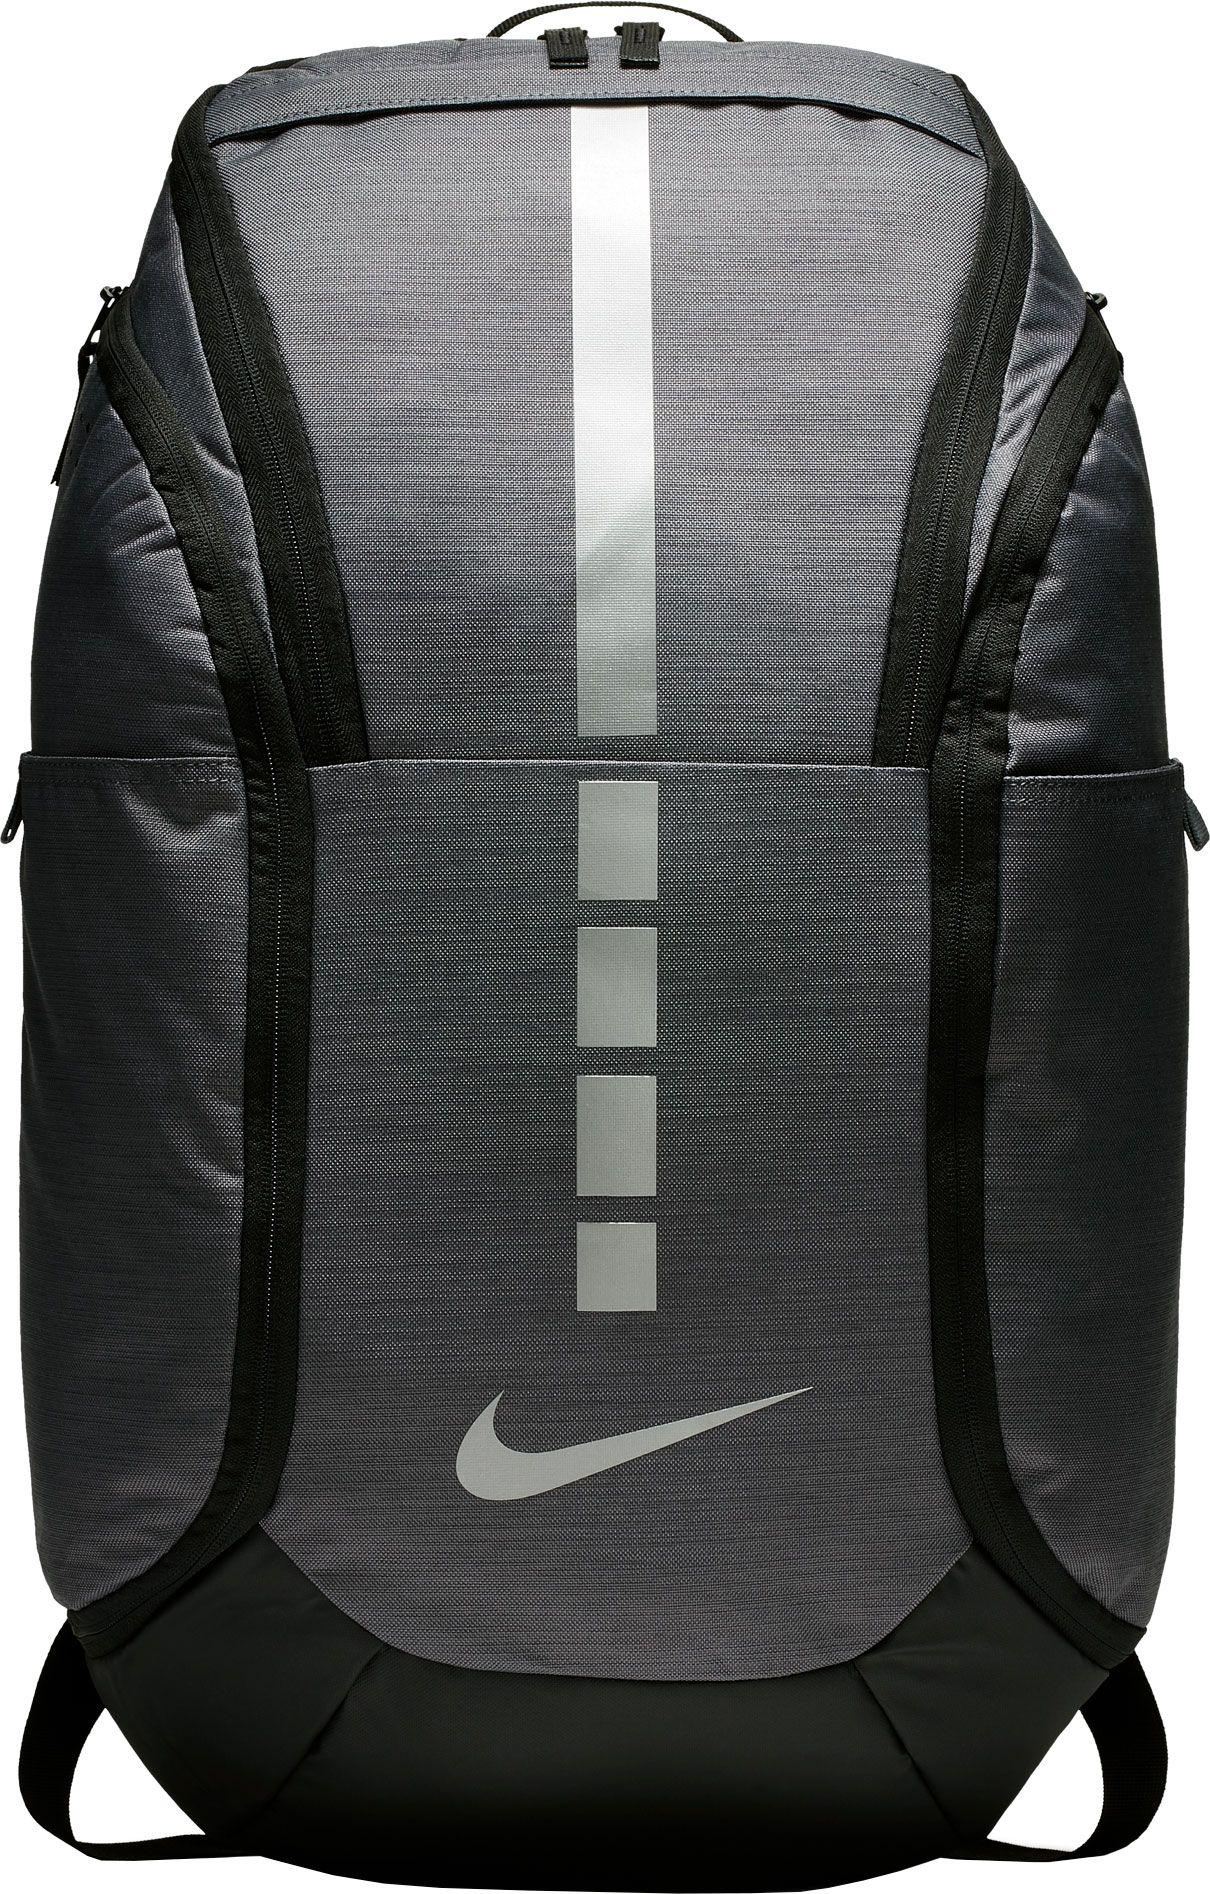 Hoops Elite Pro Basketball Backpack